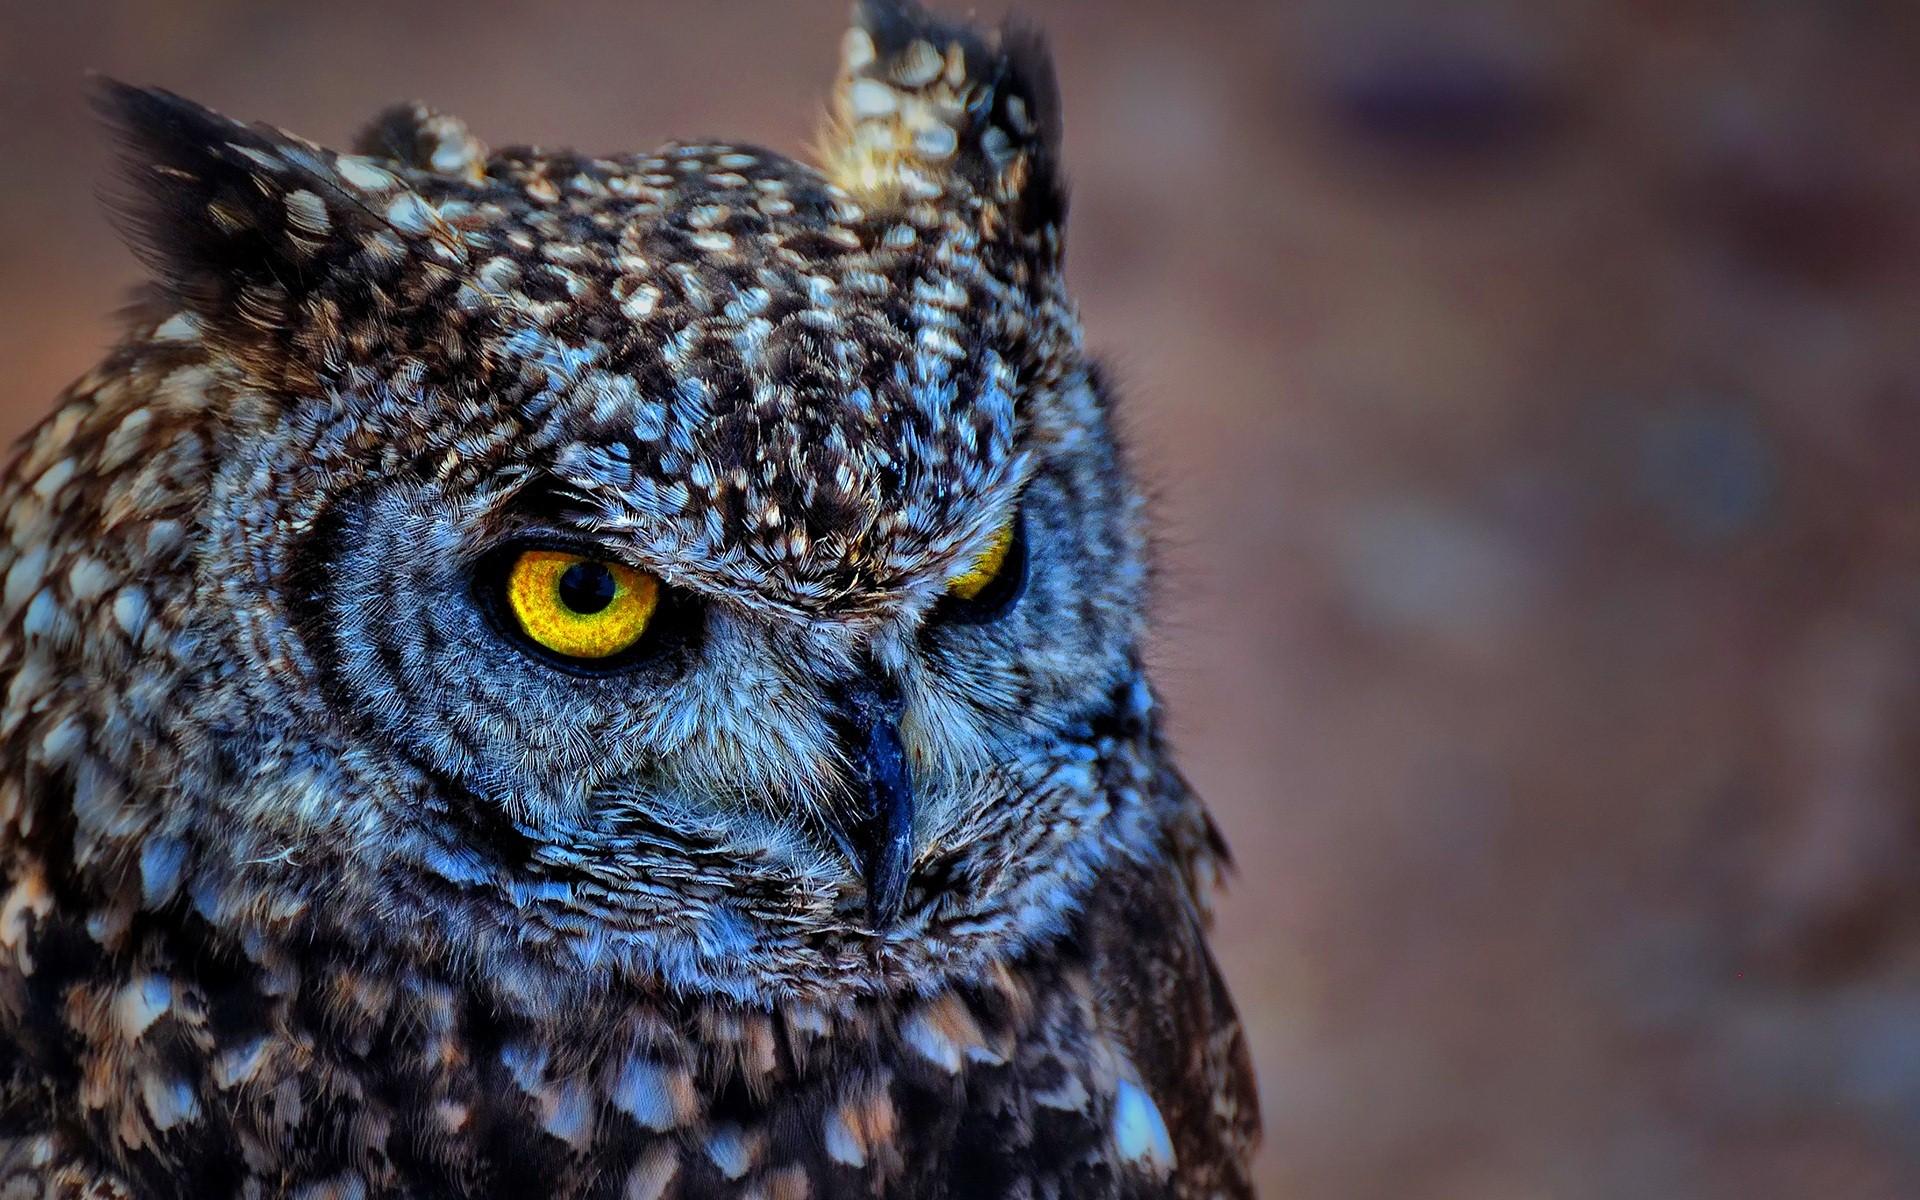 Owl Wallpapers 1080p 98J63S5   4USkY 1920x1200